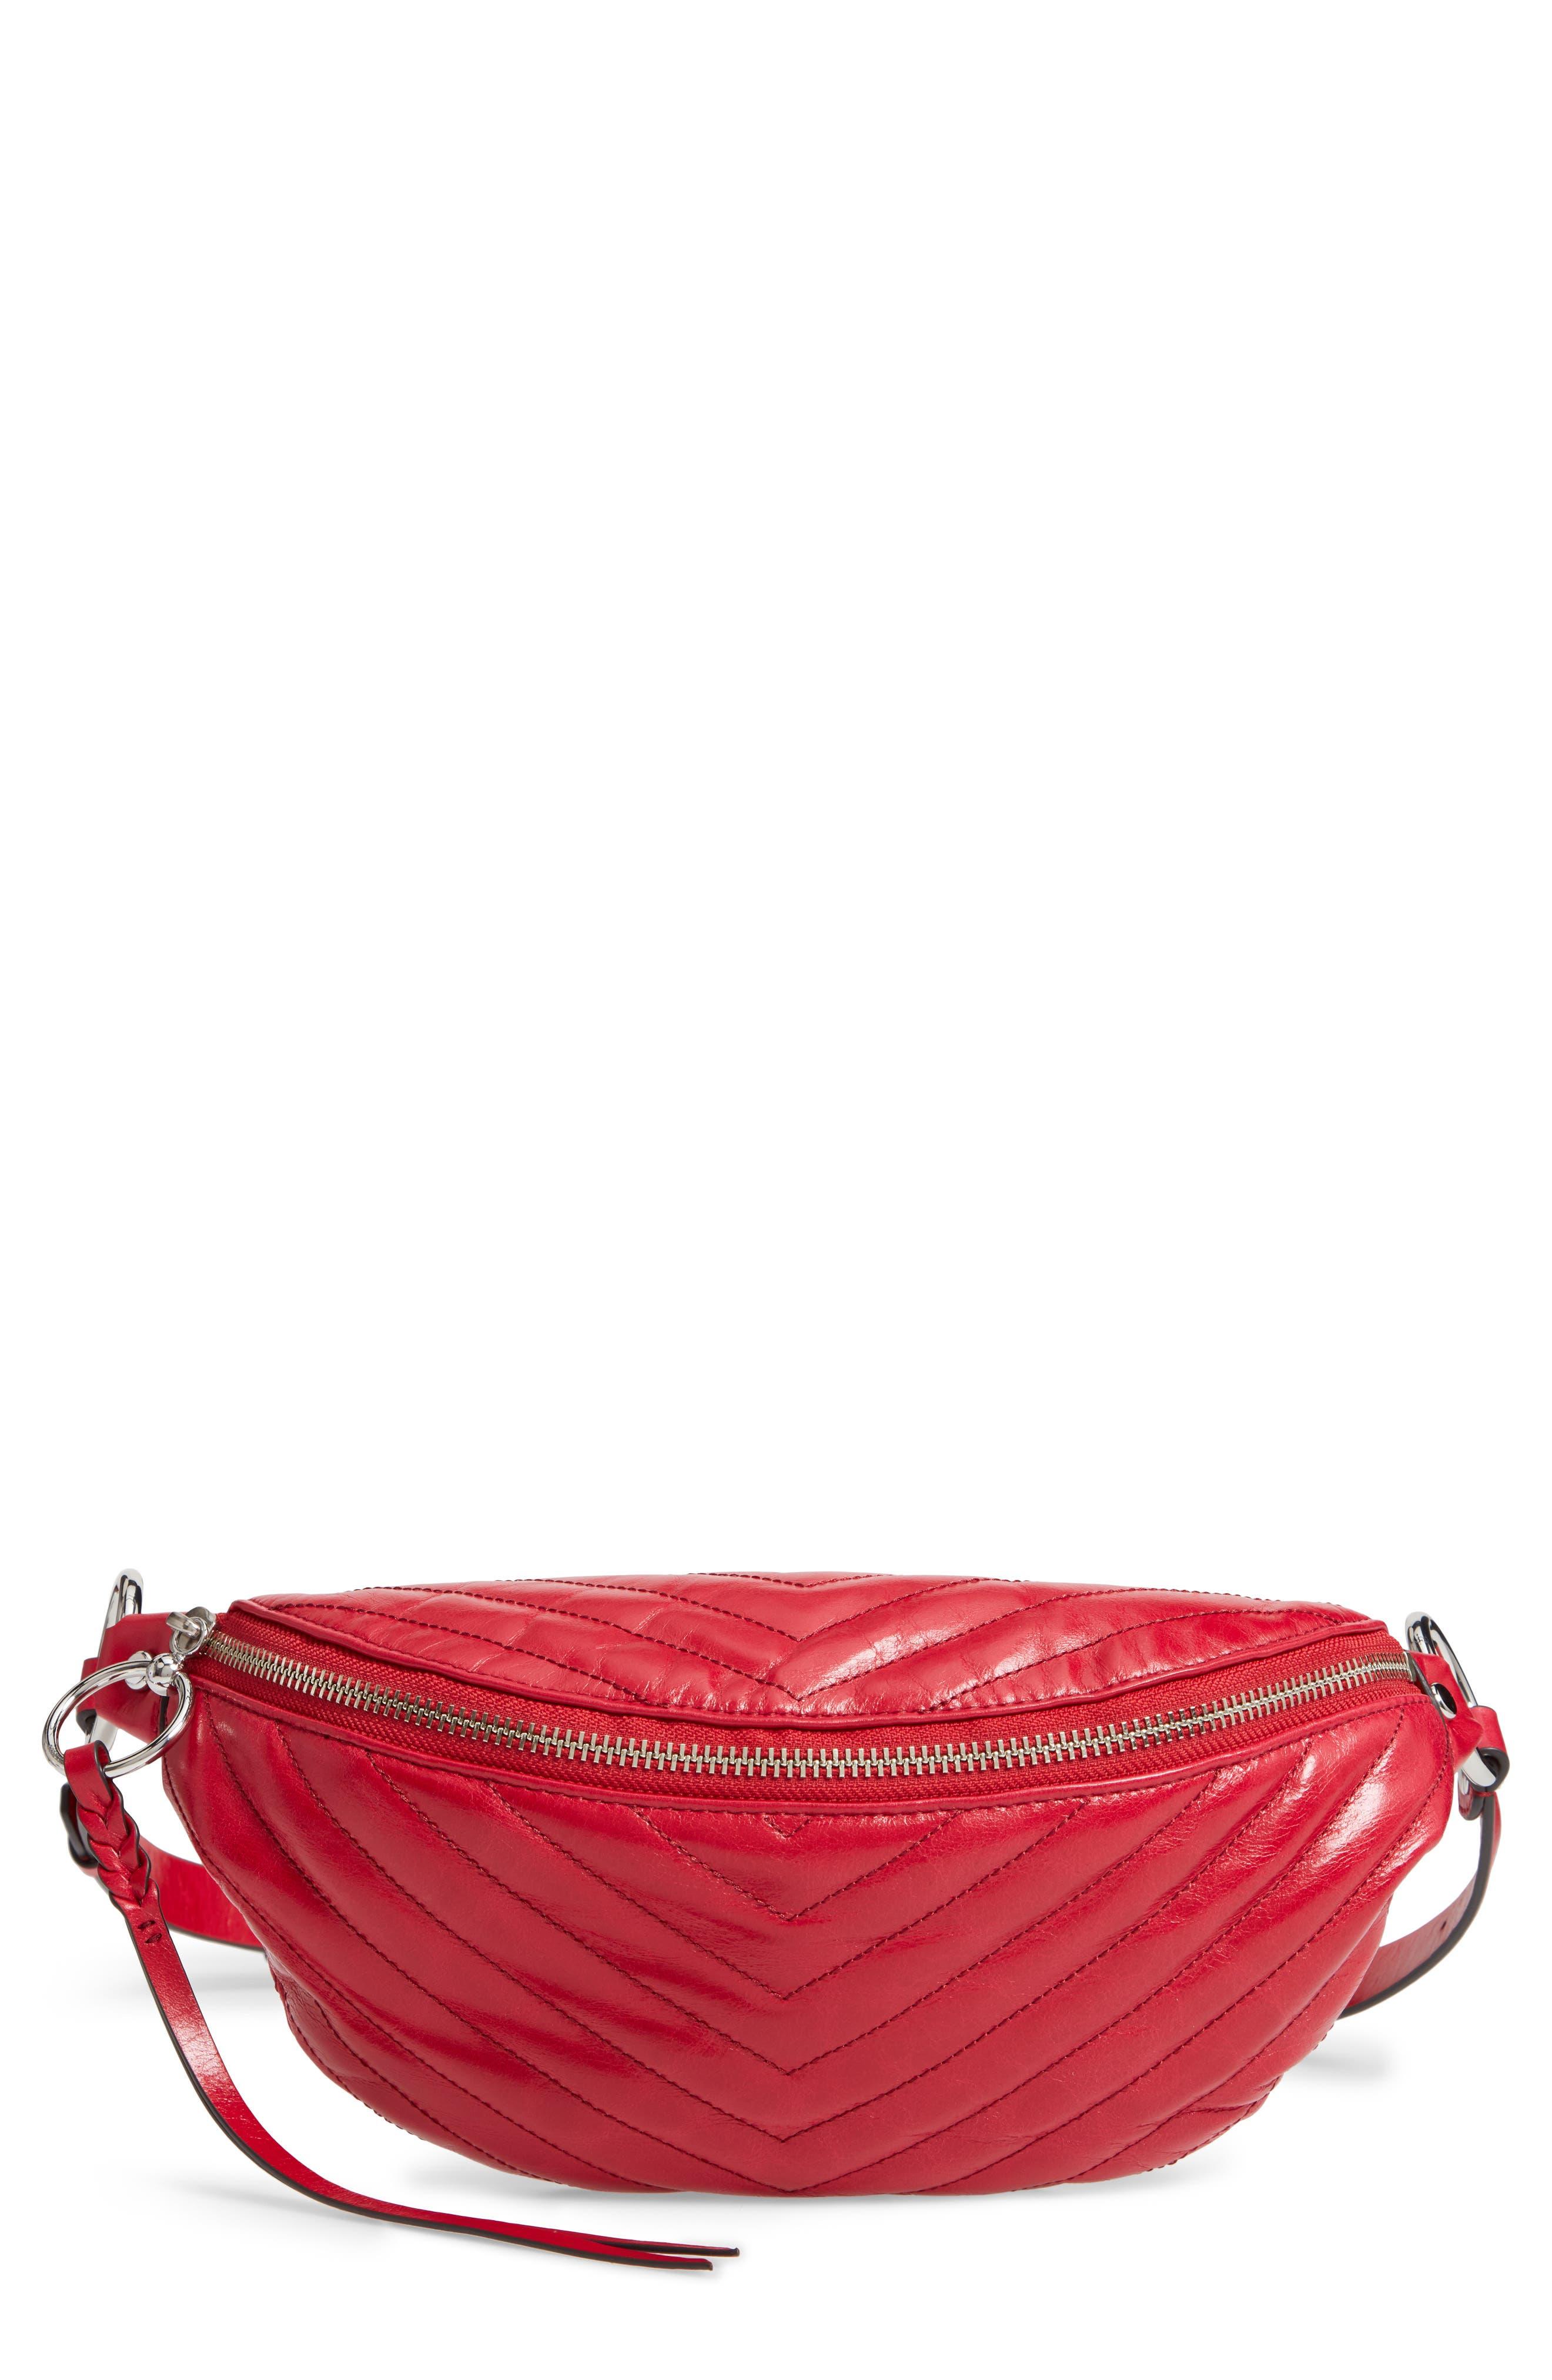 REBECCA MINKOFF Edie Leather Belt Bag, Main, color, 600